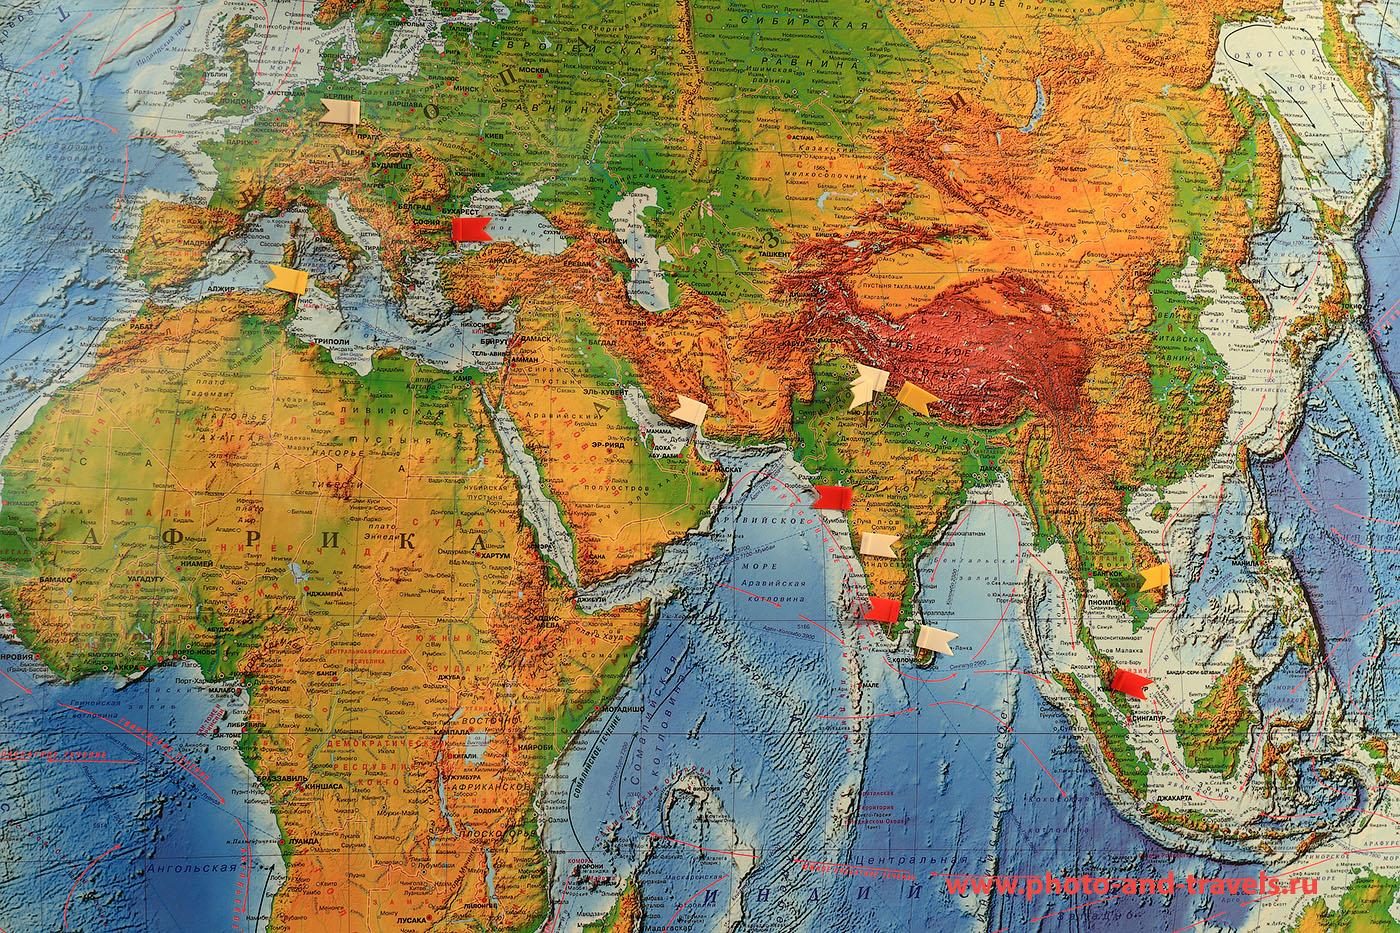 Фото 1. Карта с отметкой стран, где побывал на отдыхе автор отчета о путешествии по Индии.